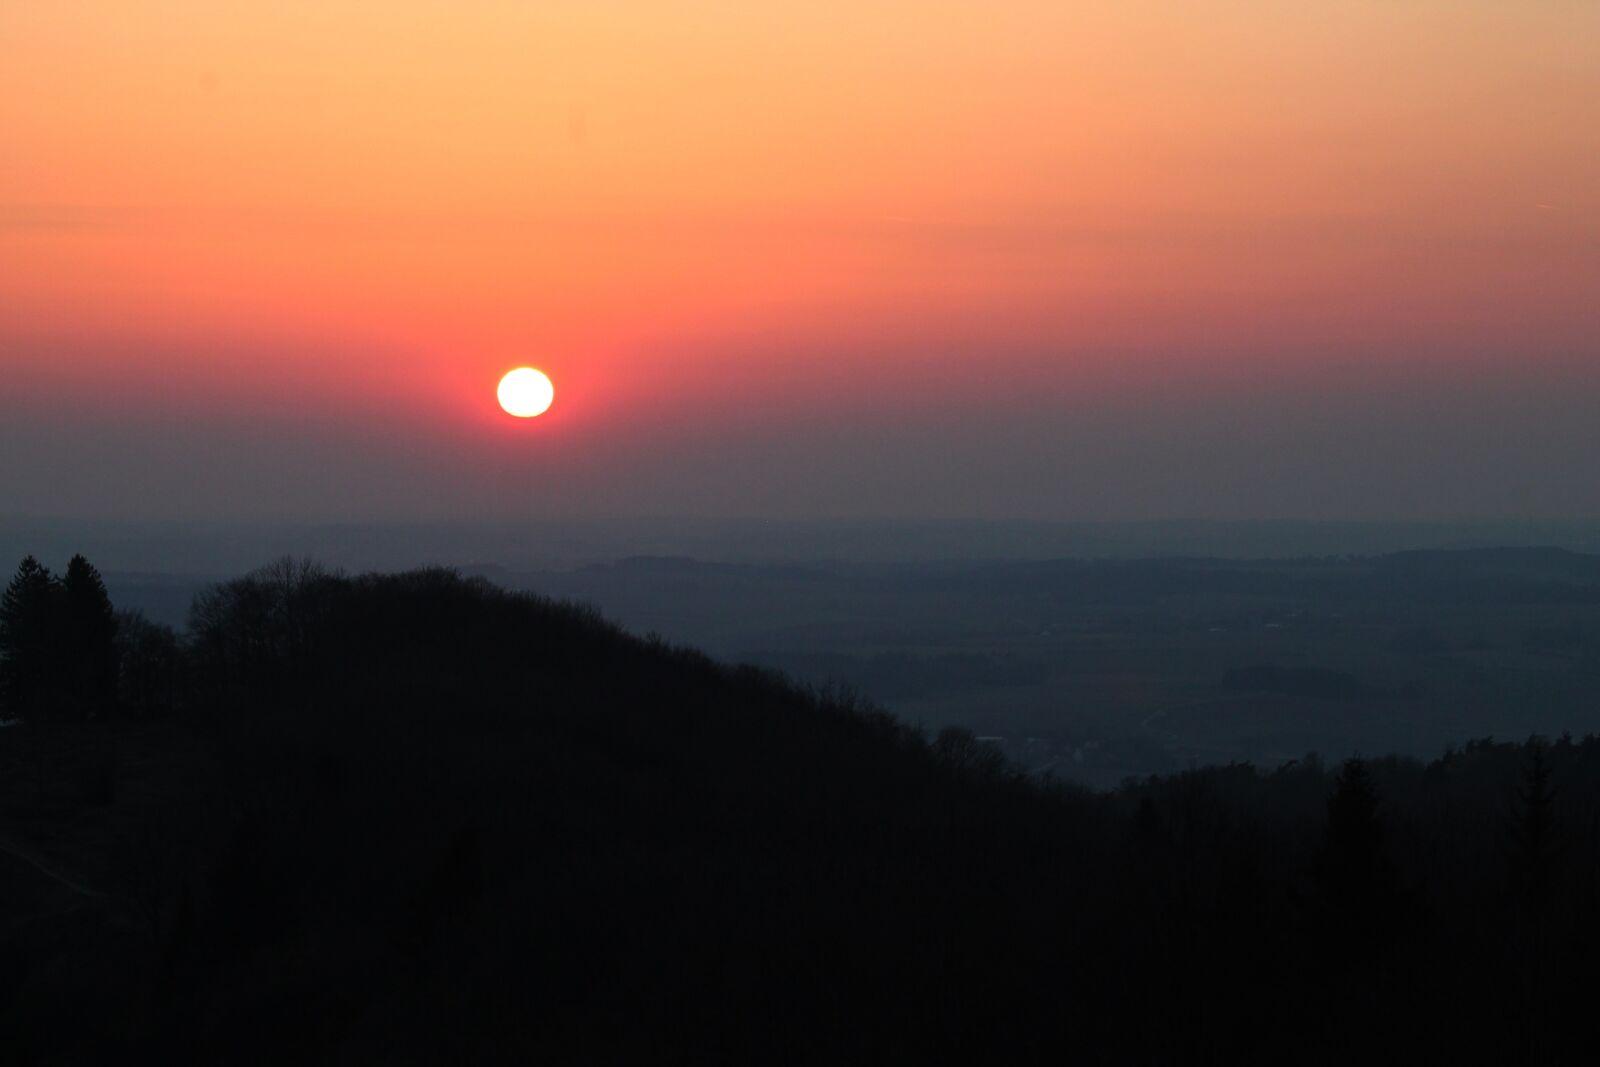 "Canon EOS 1100D (EOS Rebel T3 / EOS Kiss X50) sample photo. ""Sunset, silhouette, landscape"" photography"